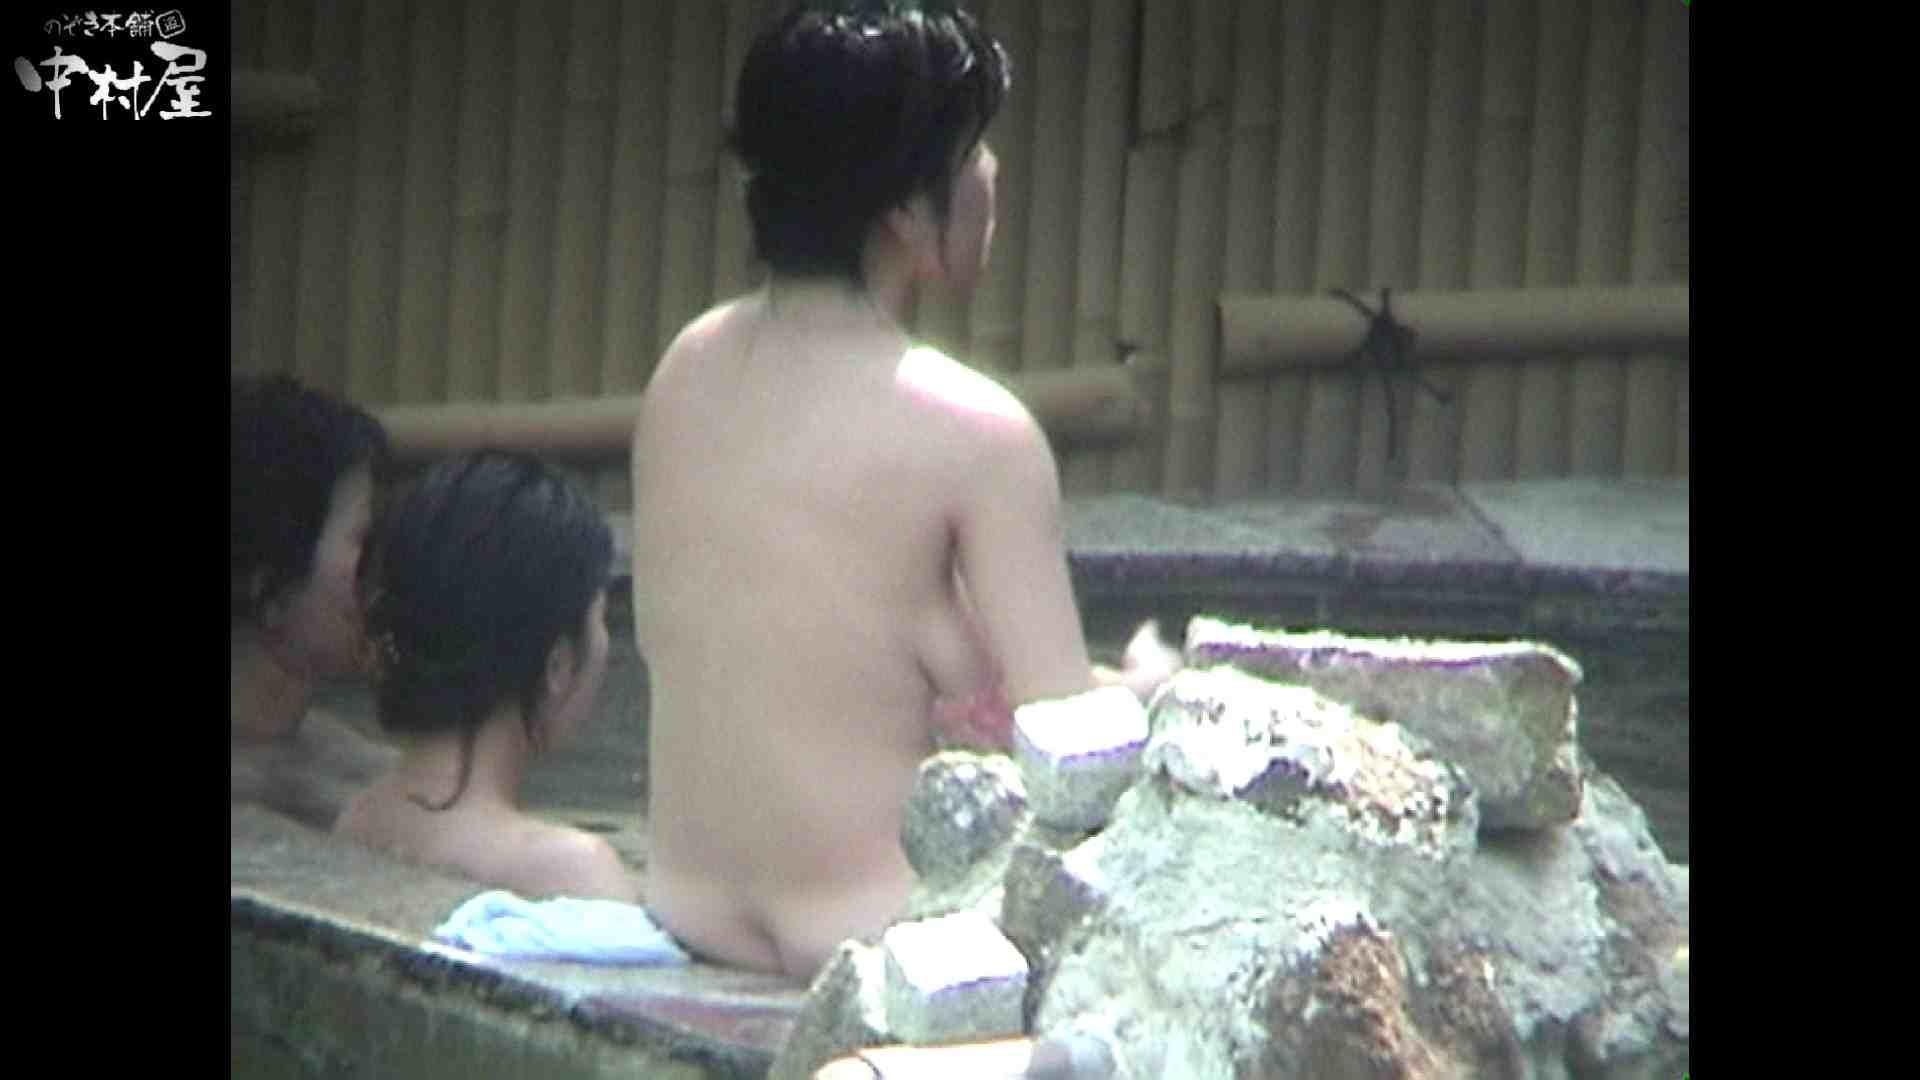 Aquaな露天風呂Vol.936 盗撮映像  110Pix 89